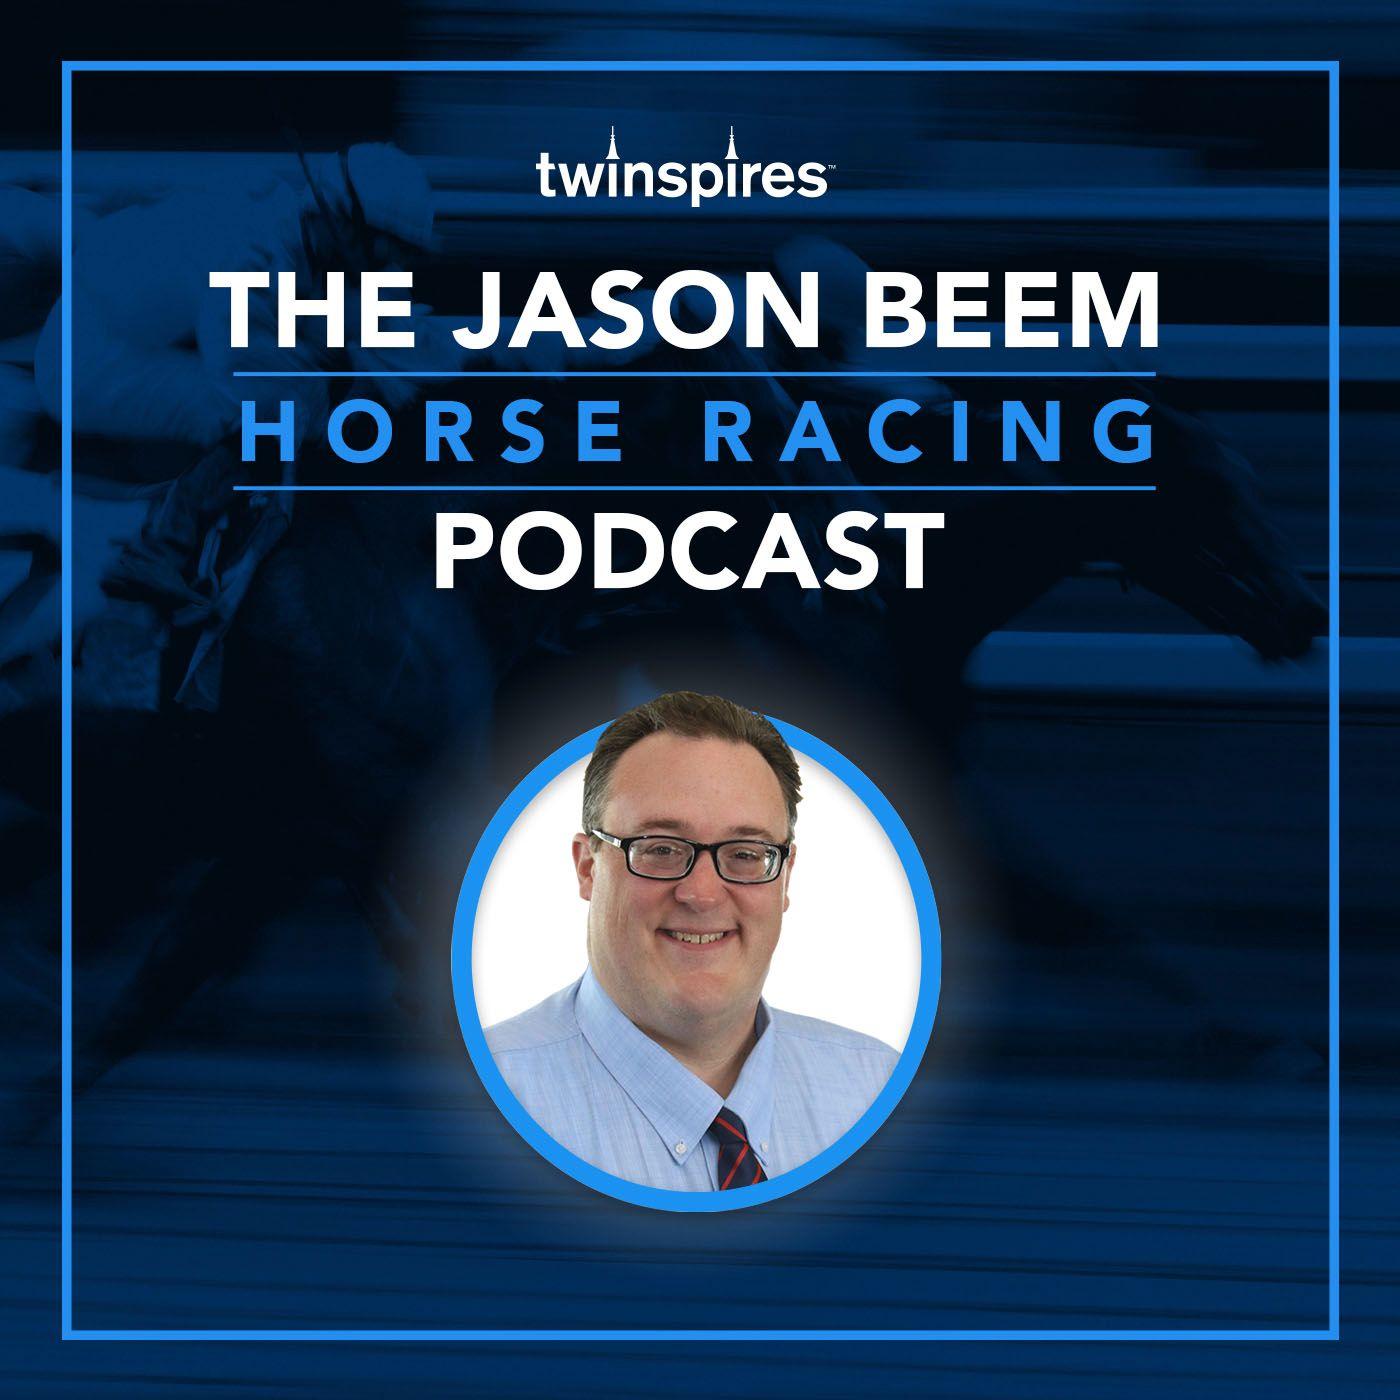 Jason Beem Horse Racing Podcast